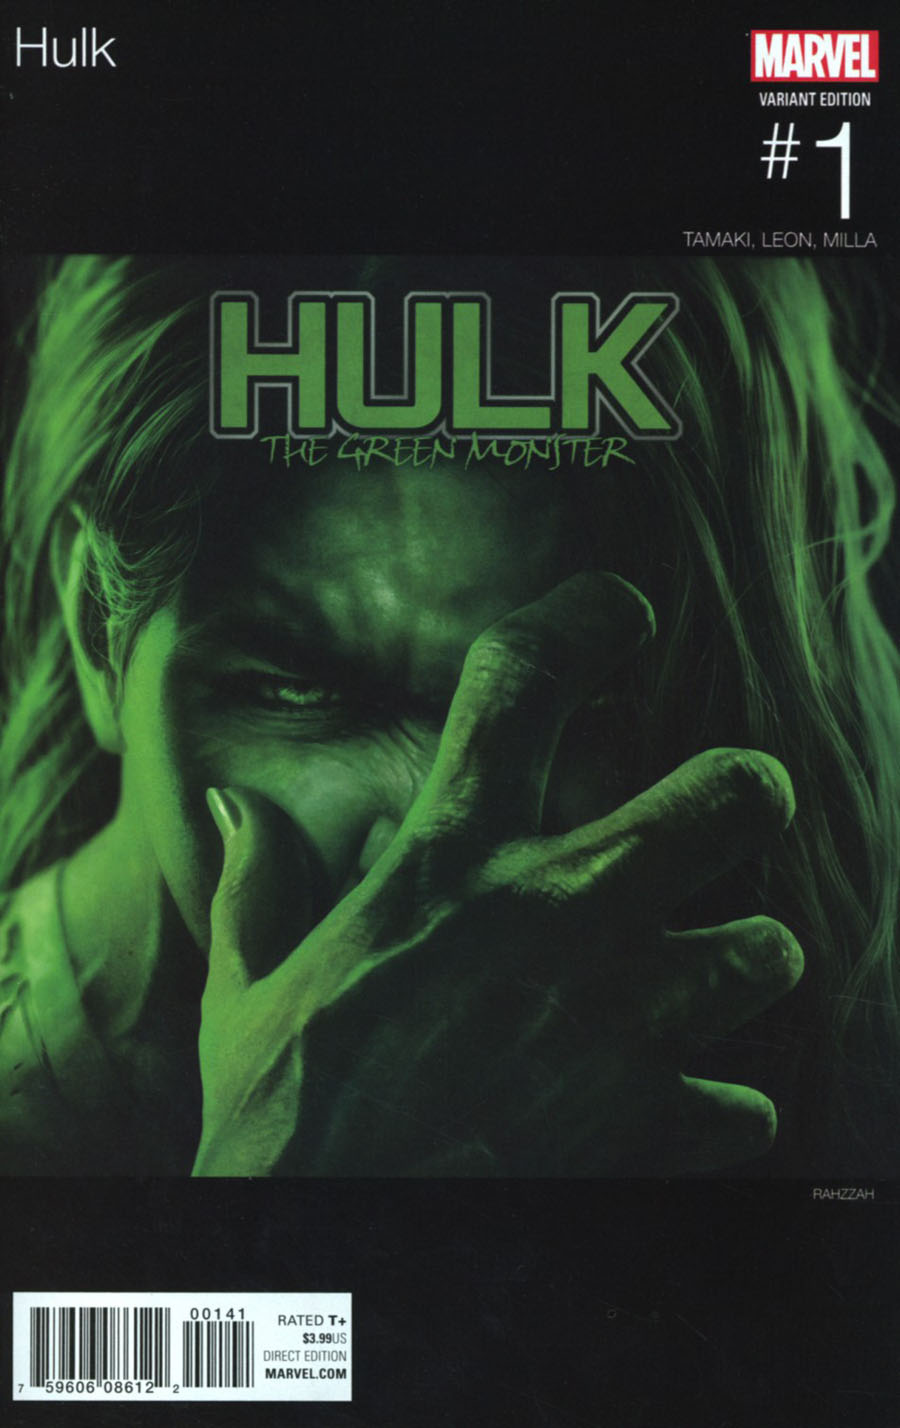 Hulk Vol 4 #1 Cover C Variant Rahzzah Marvel Hip-Hop Cover (Marvel Now Tie-In)